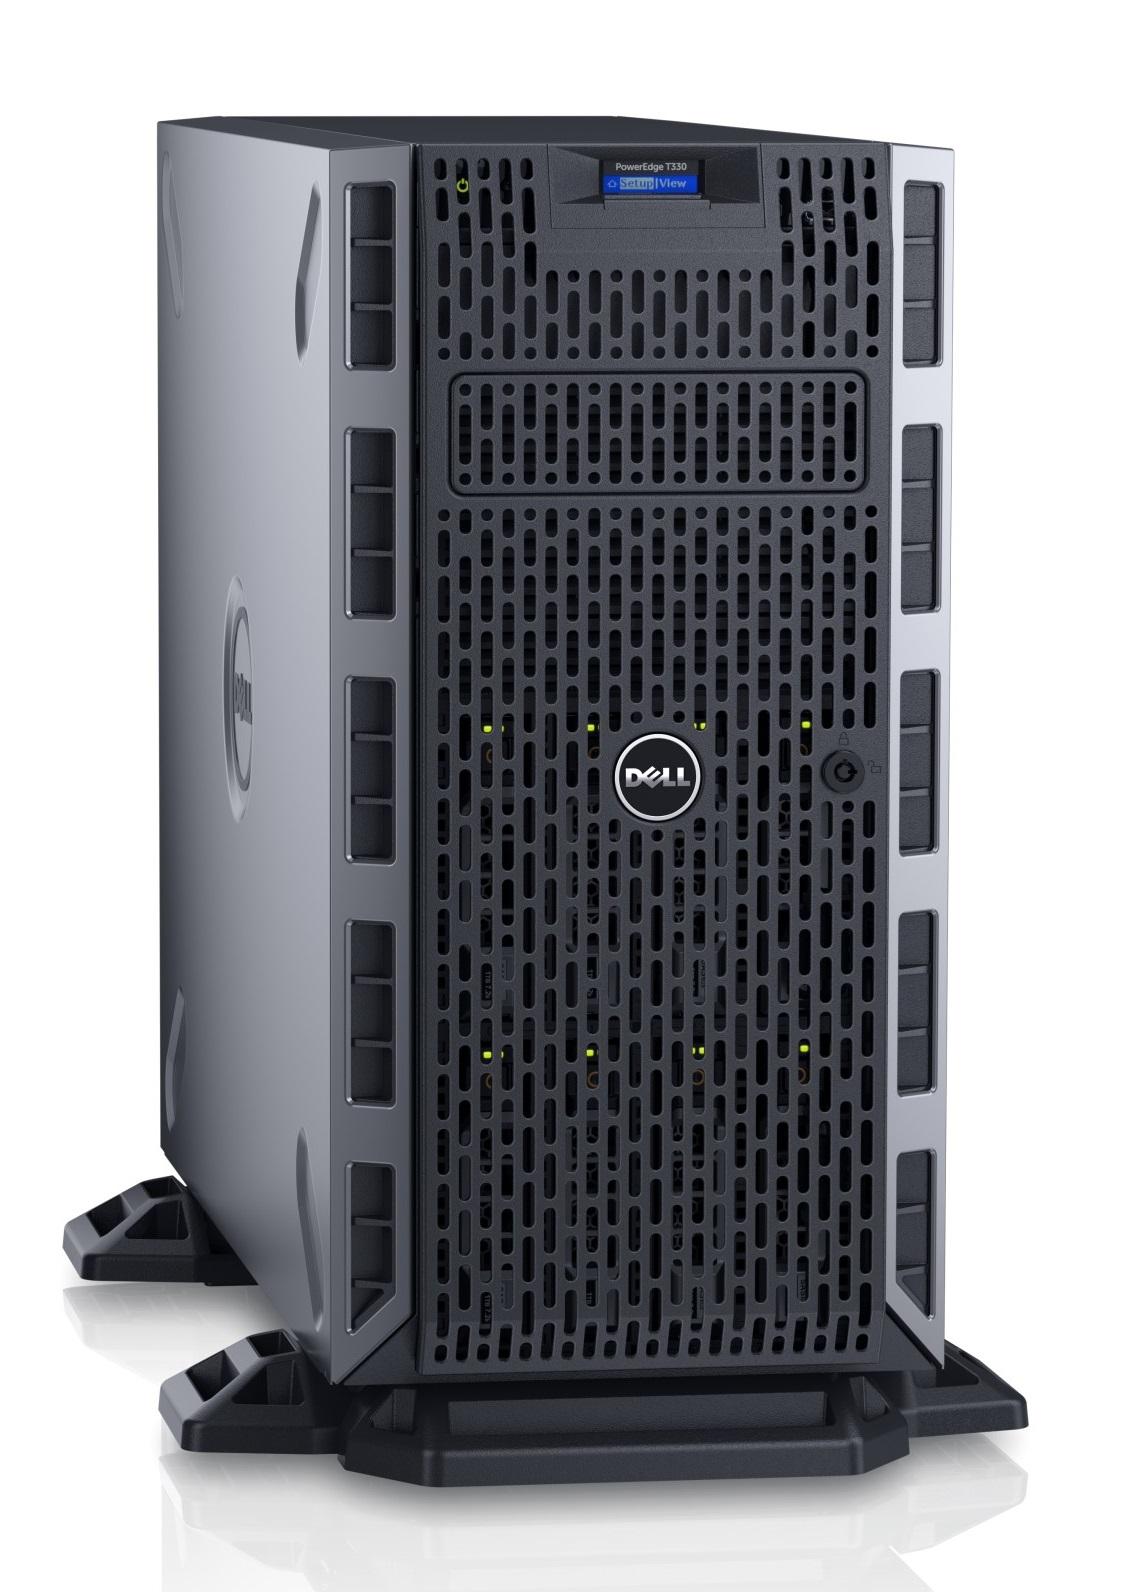 DELL server PowerEdge T330 E3-1230 /16G/4x300 10k SAS/H730/ iDrac/2x495W/3yNBD PS